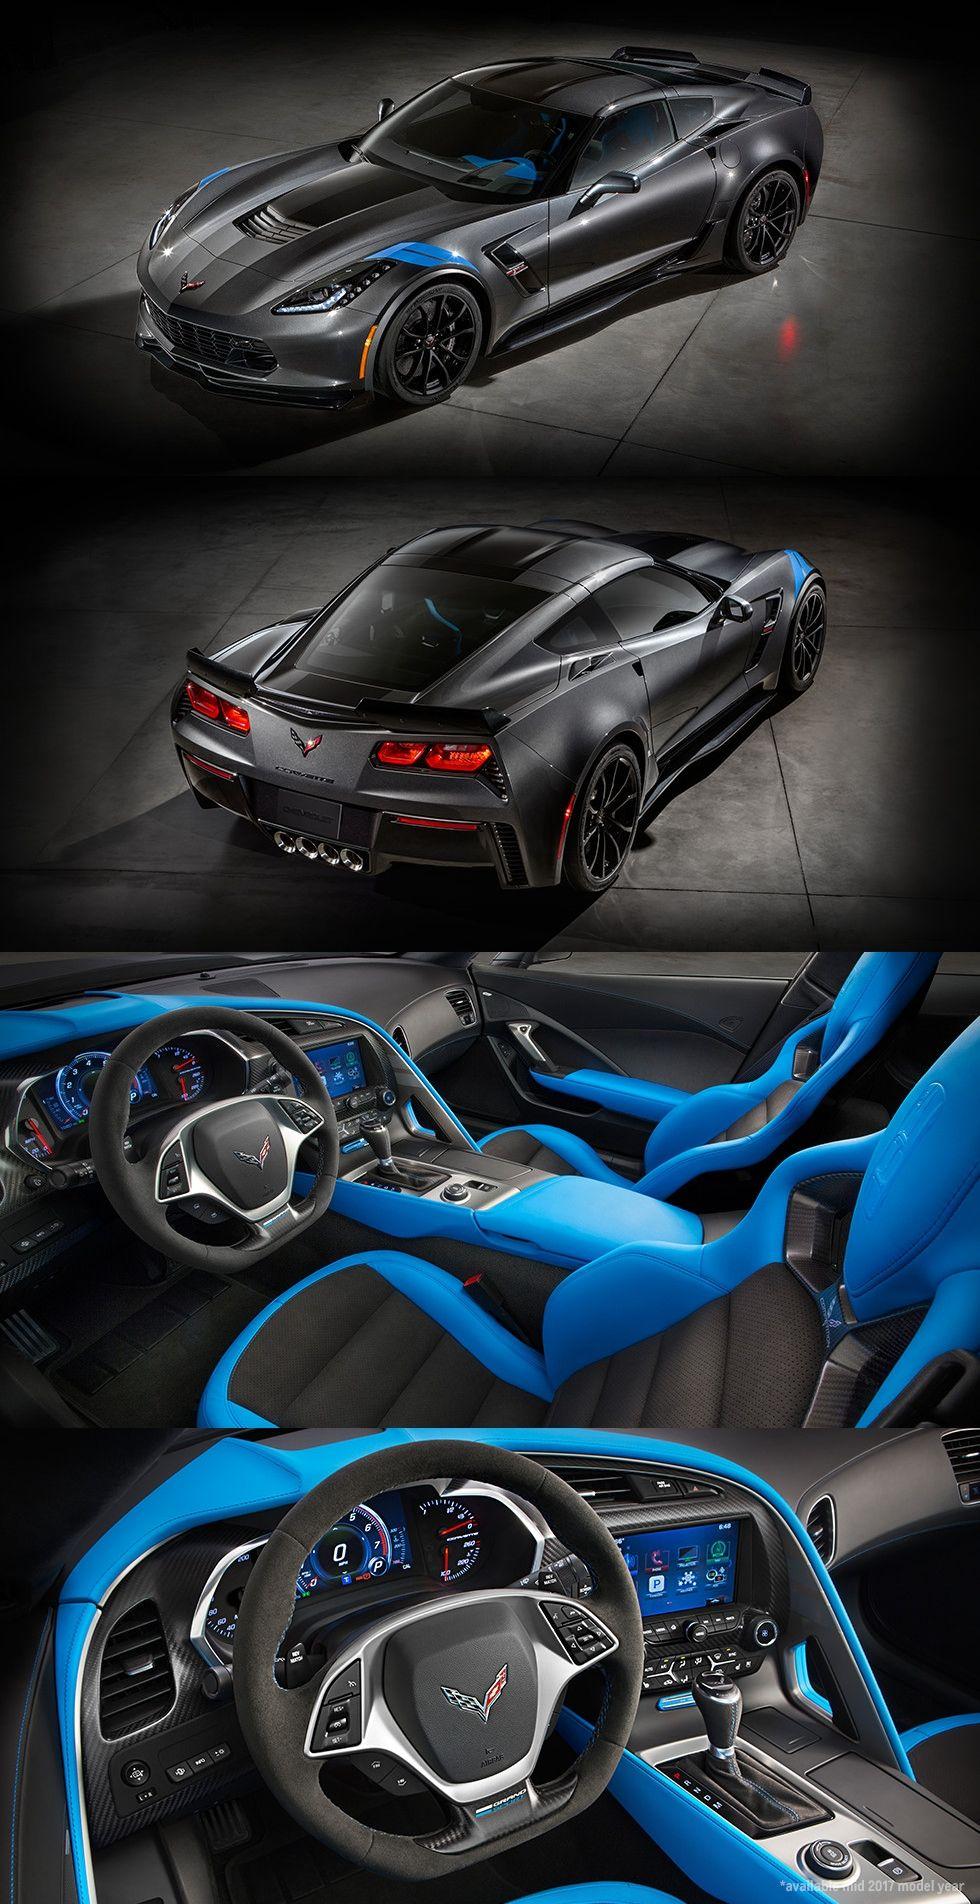 2017 chevrolet corvette grand sport collector edition carros pinterest coches. Black Bedroom Furniture Sets. Home Design Ideas